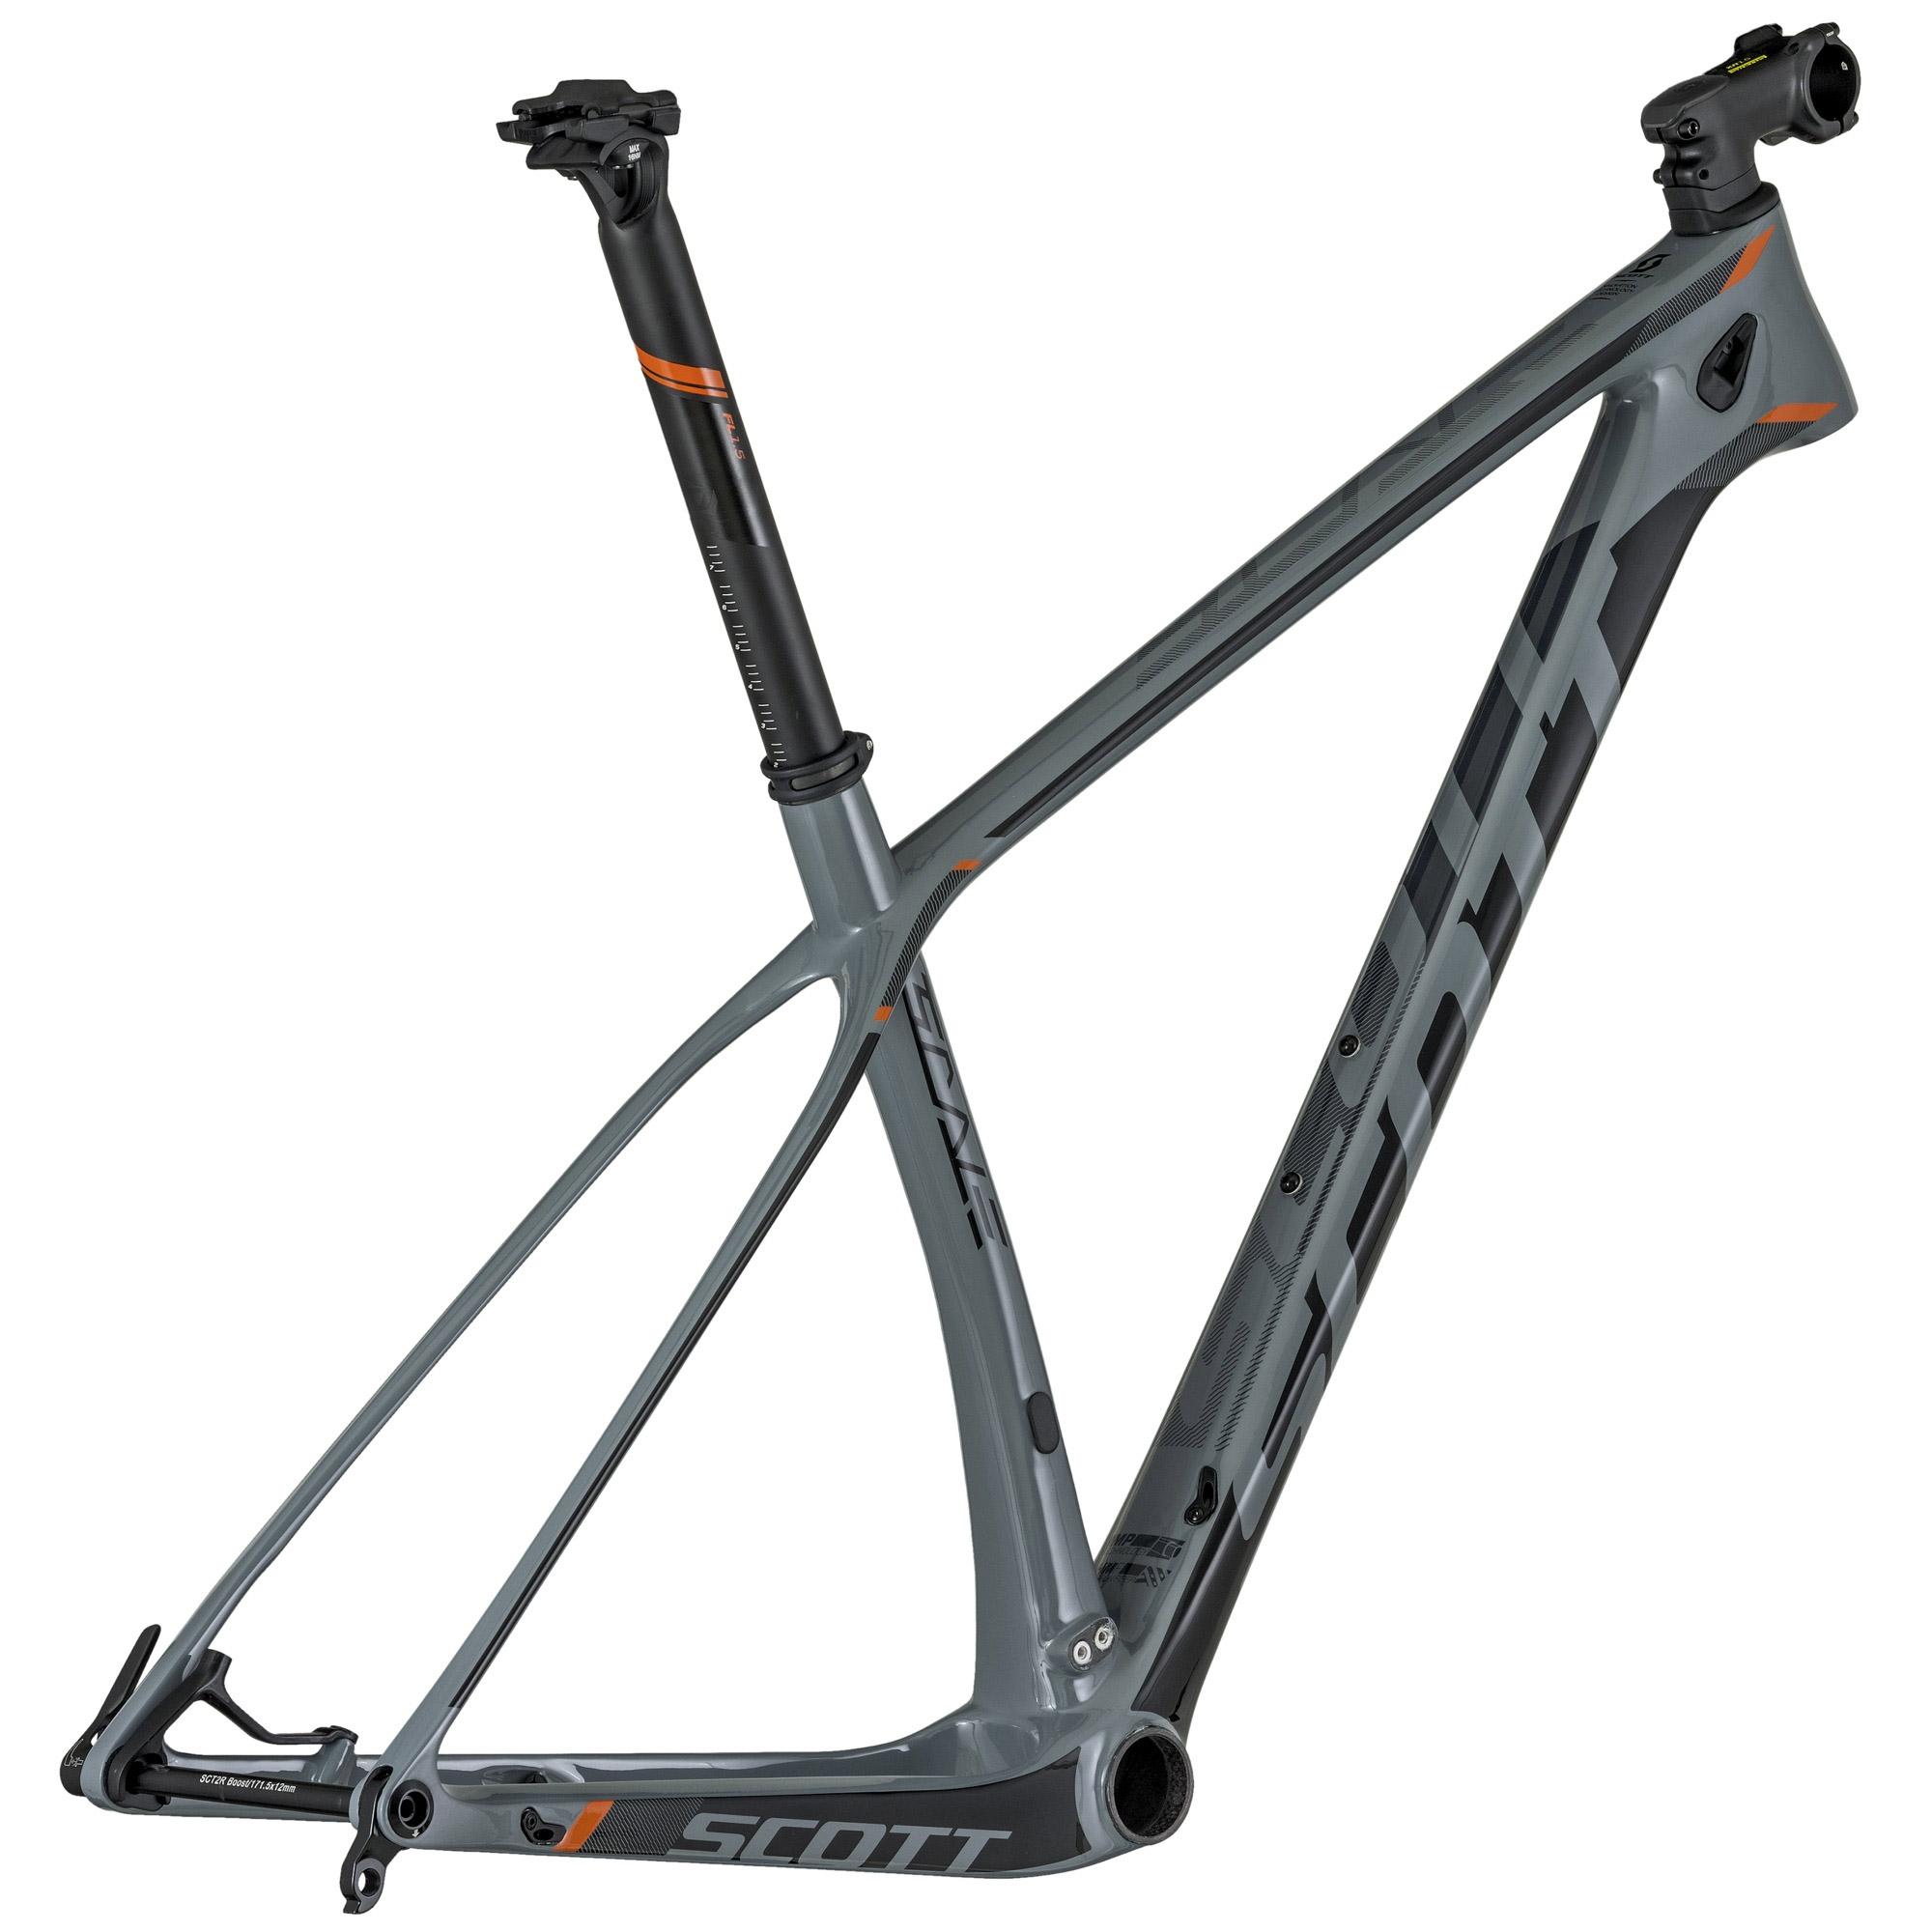 Scott Scale 910 Rahmen-Set, Modell 2018 - Bike-3, der Scott Fahrrad S